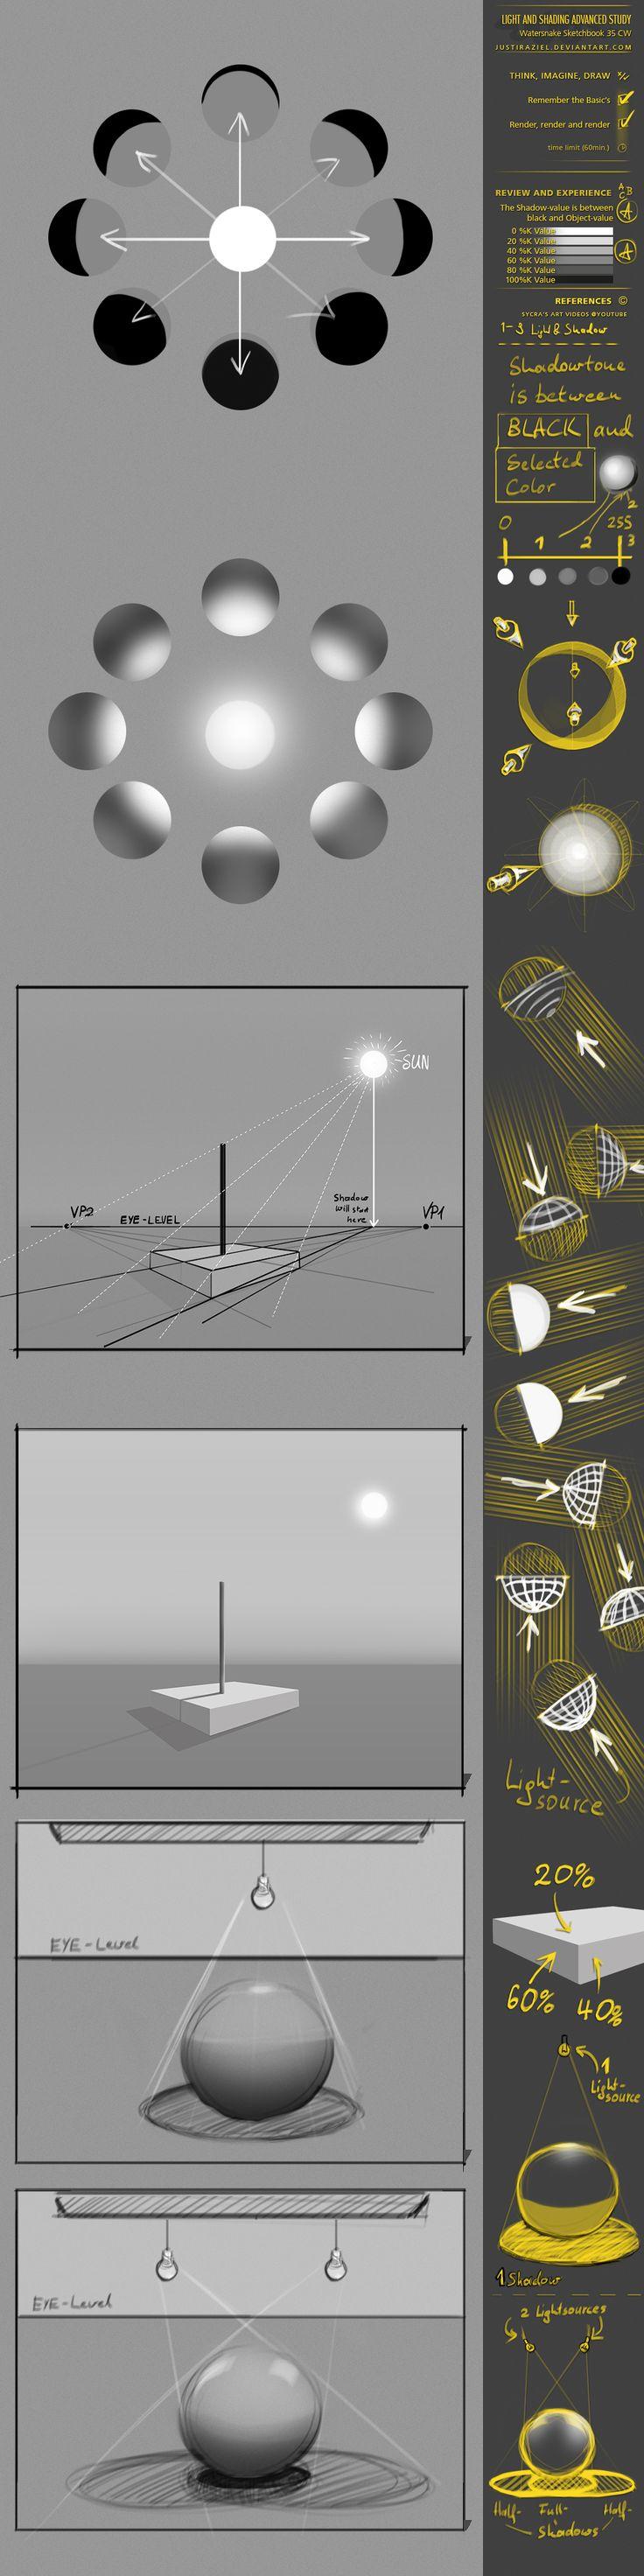 CW35 Light study by JustIRaziel on deviantART